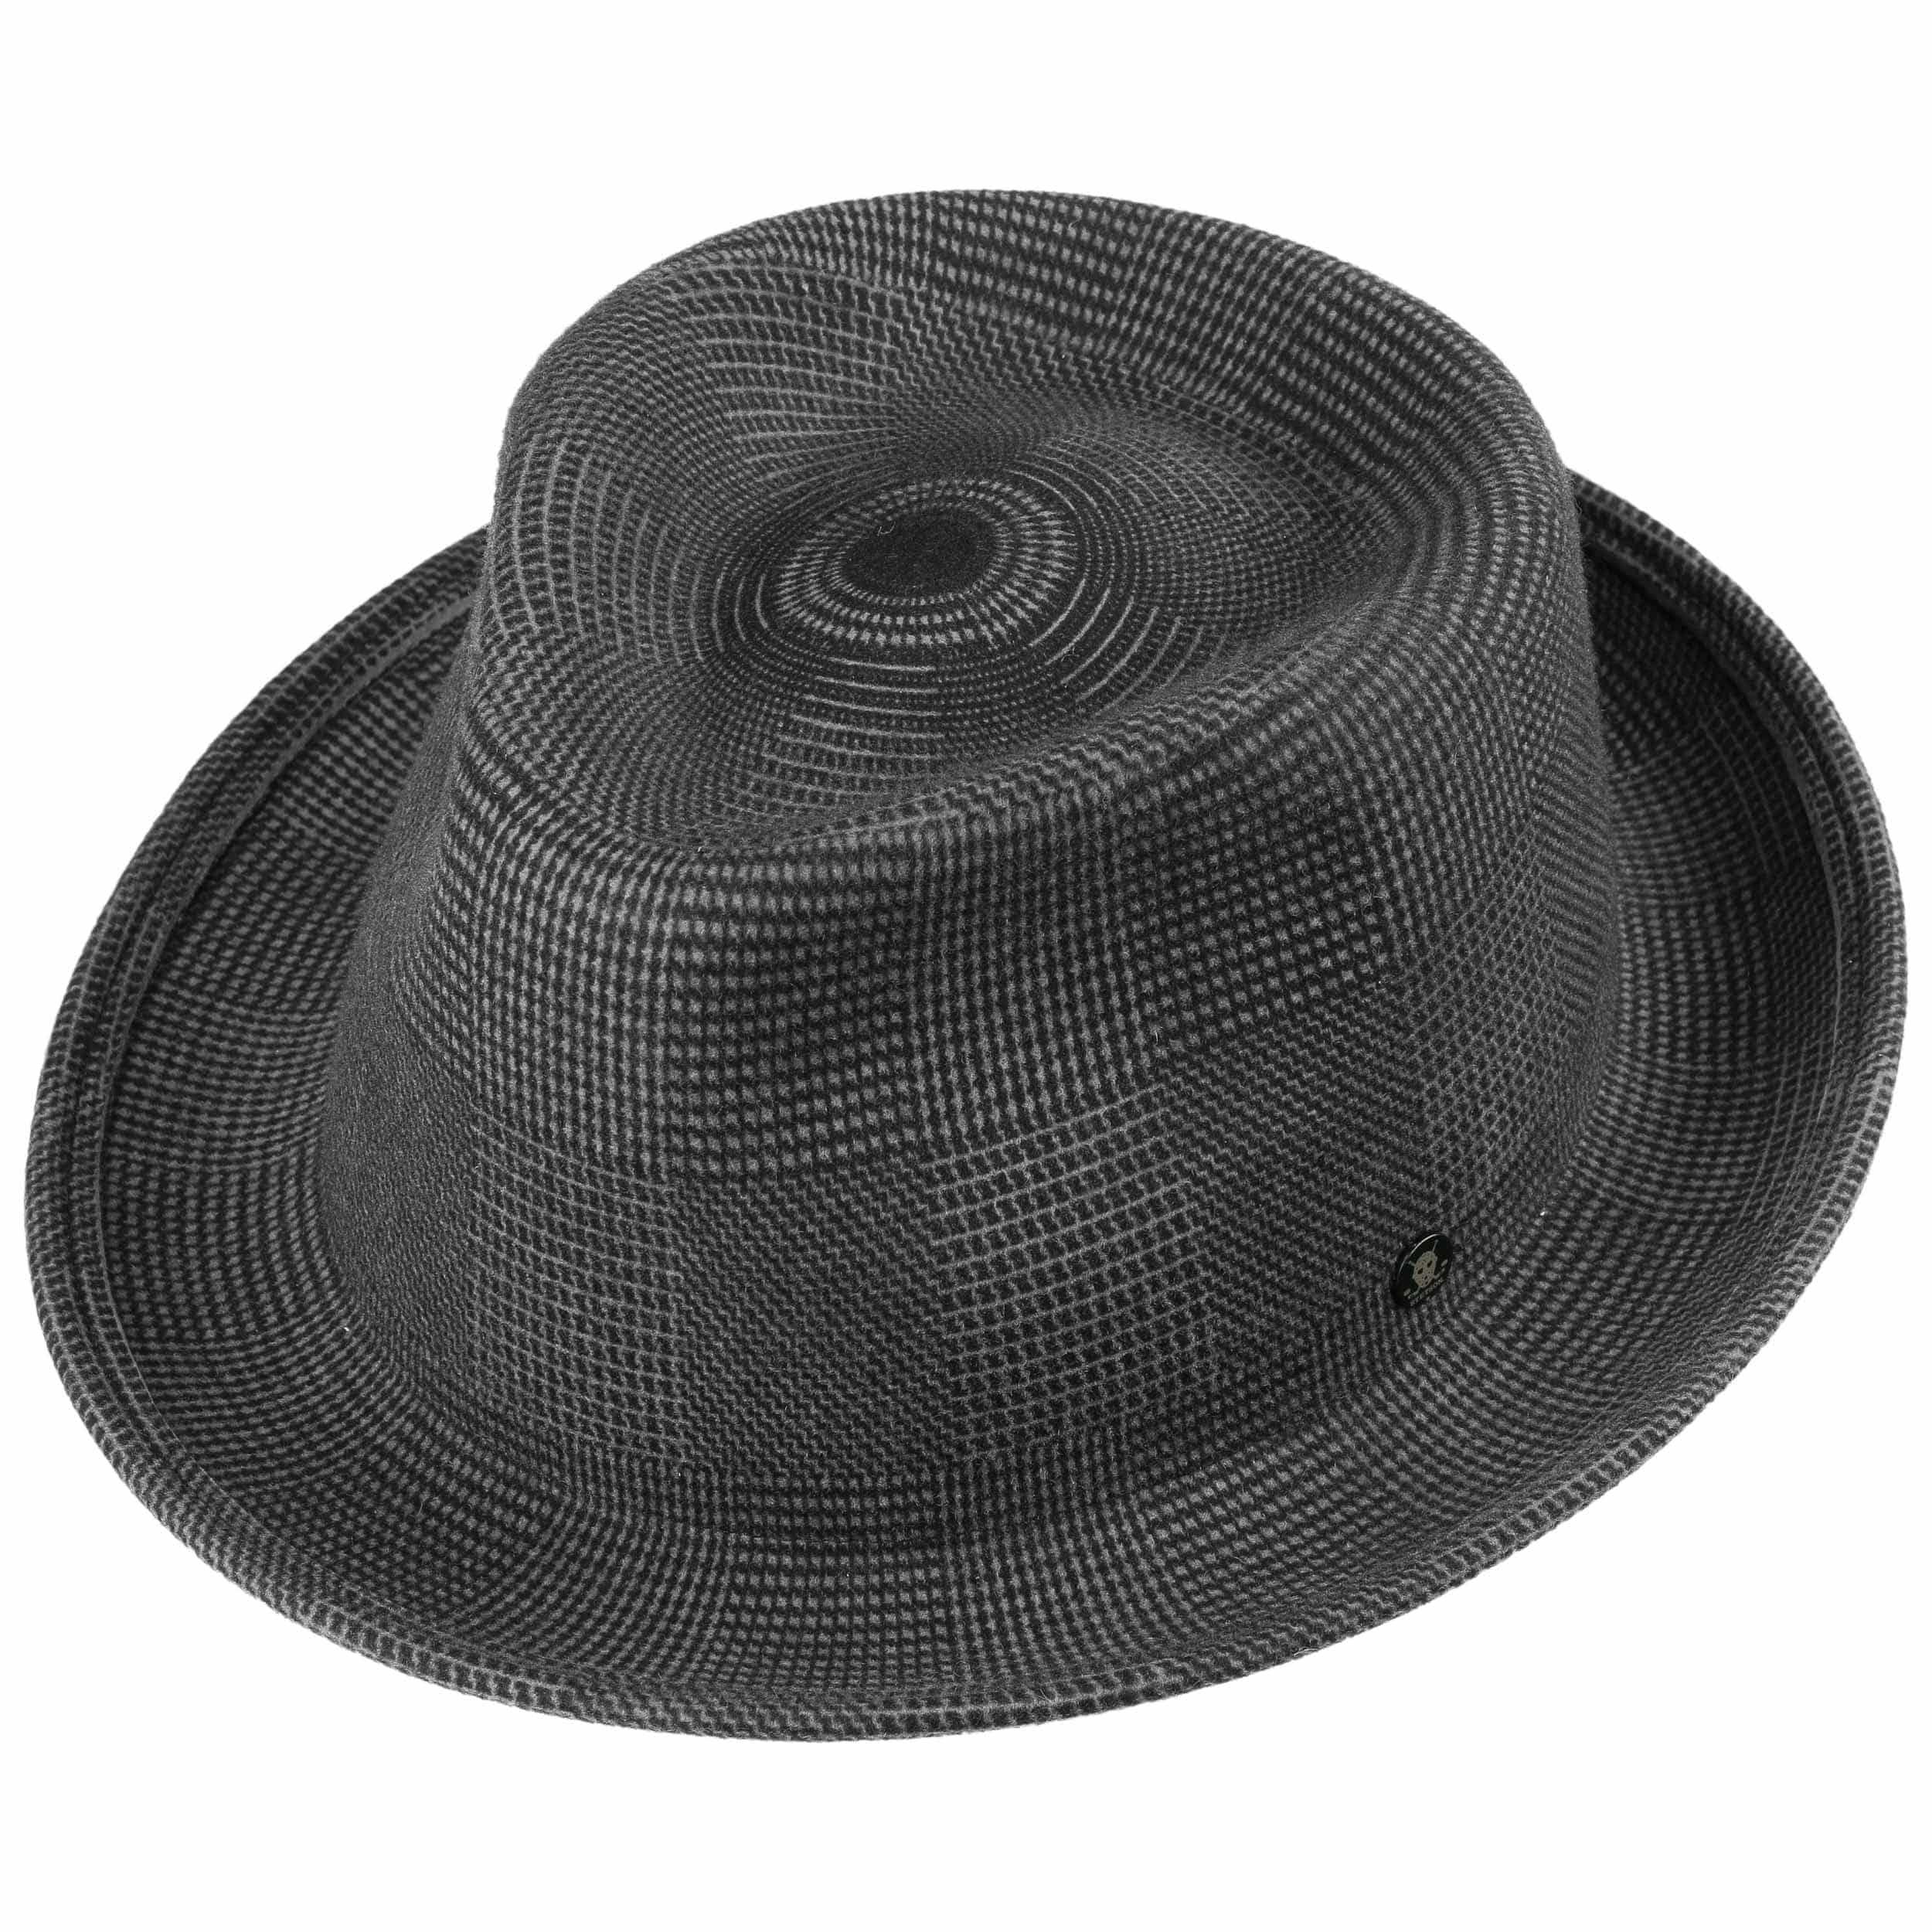 82b1a7379fdfca Virgi Wool Felt Fedora Hat by Stetson - grey 1 ...